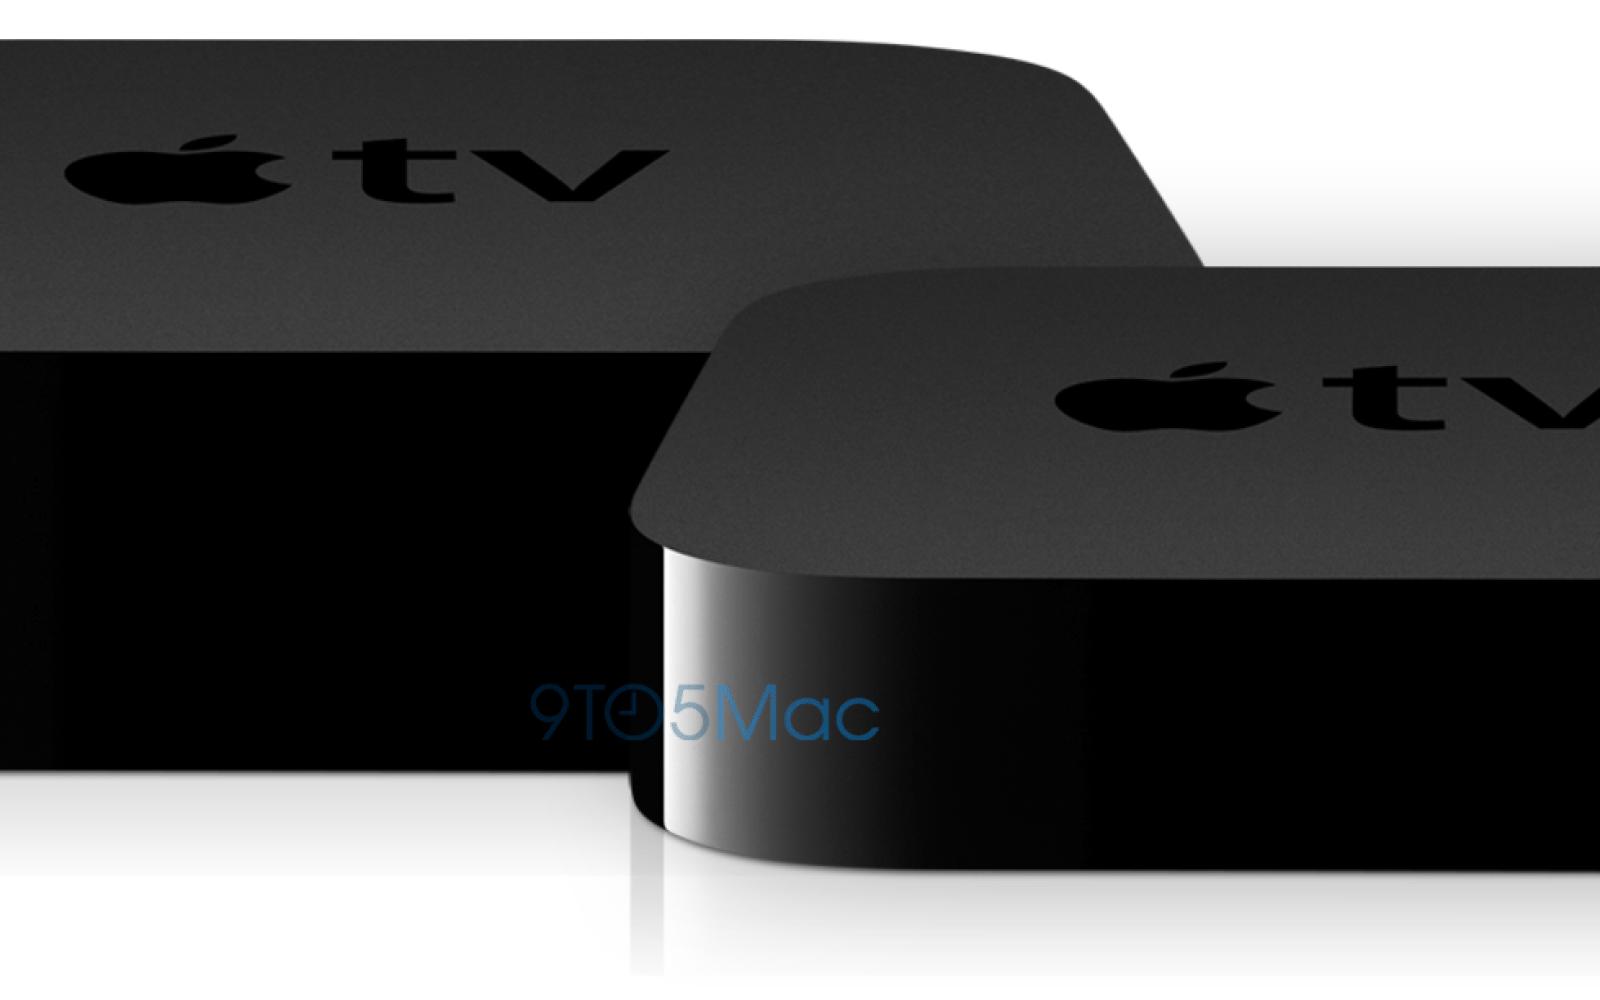 Apple TV 4 hardware revealed: A8 chip, black remote, 8/16GB